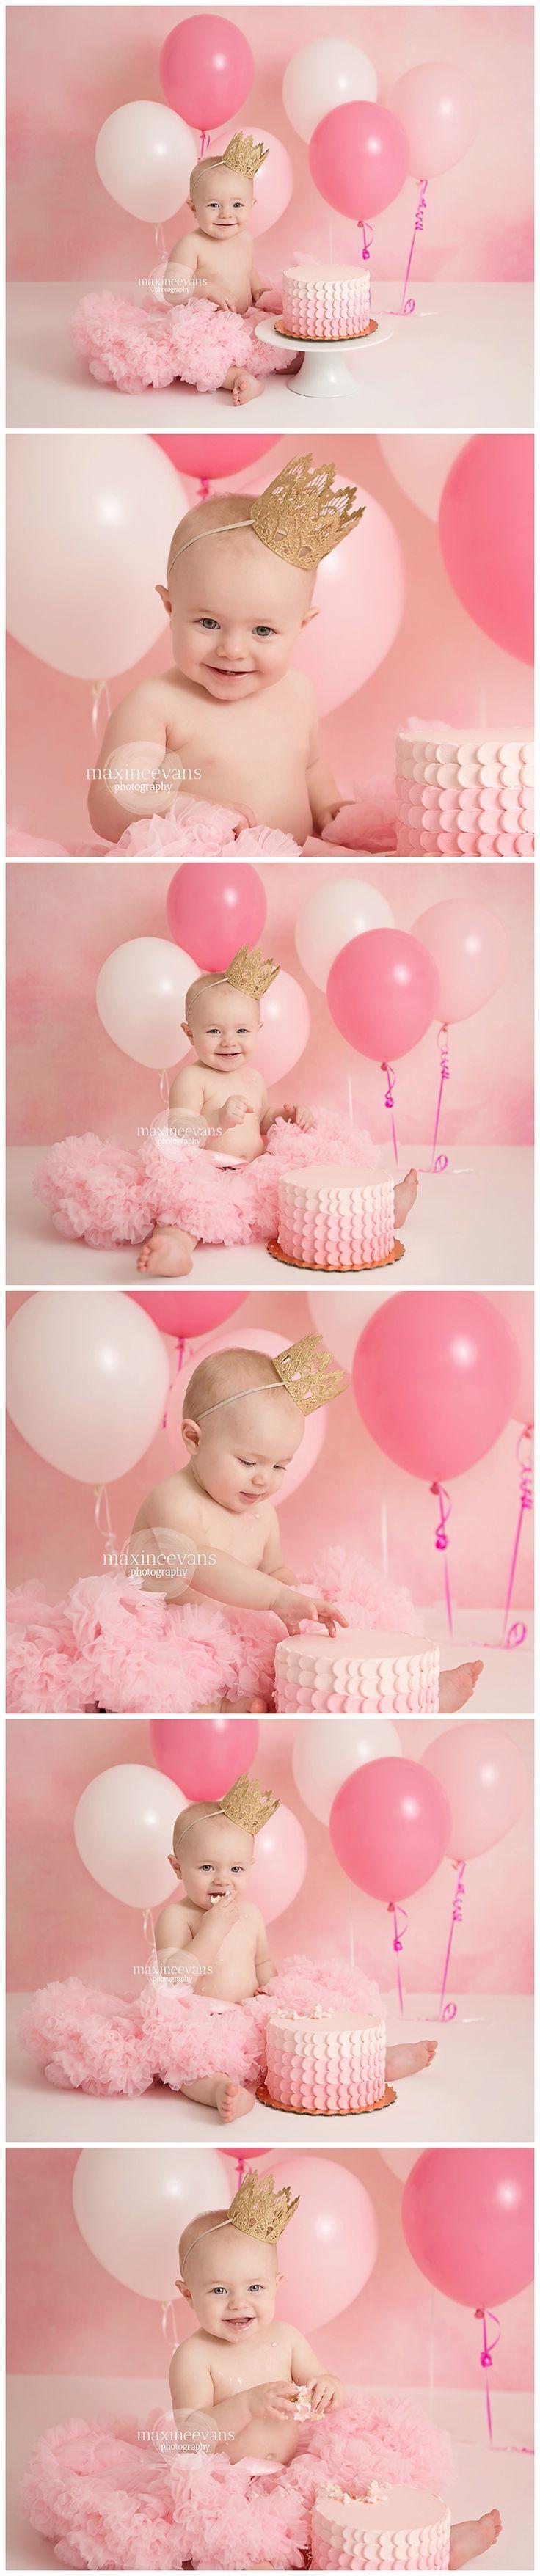 Baby photography santa monica harper in 2020 birthday